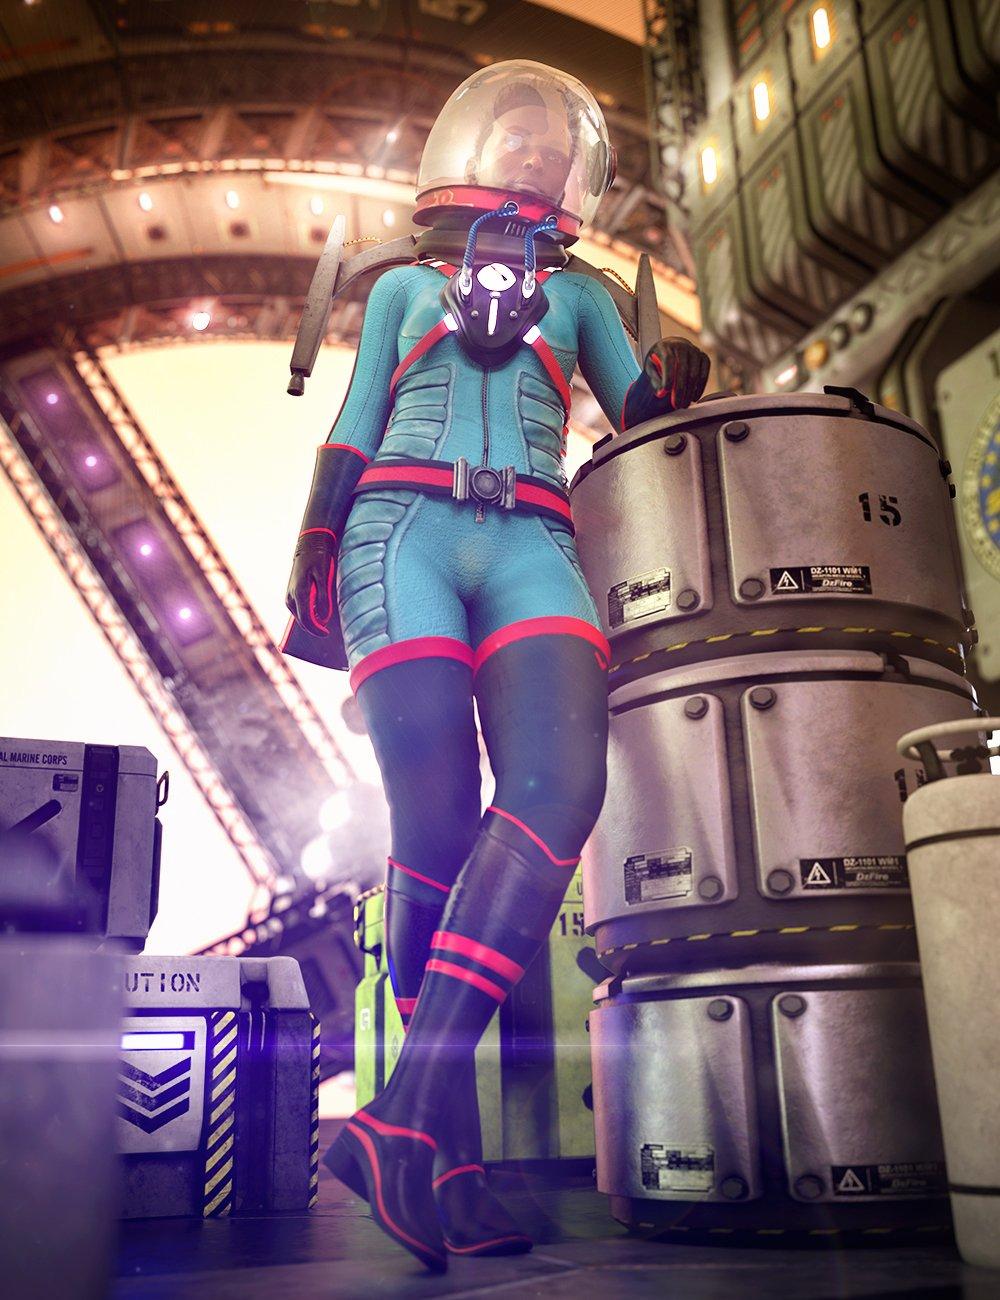 Stellar Spacesuit for Genesis 8.1 Females by: Barbara BrundonUmblefugly, 3D Models by Daz 3D